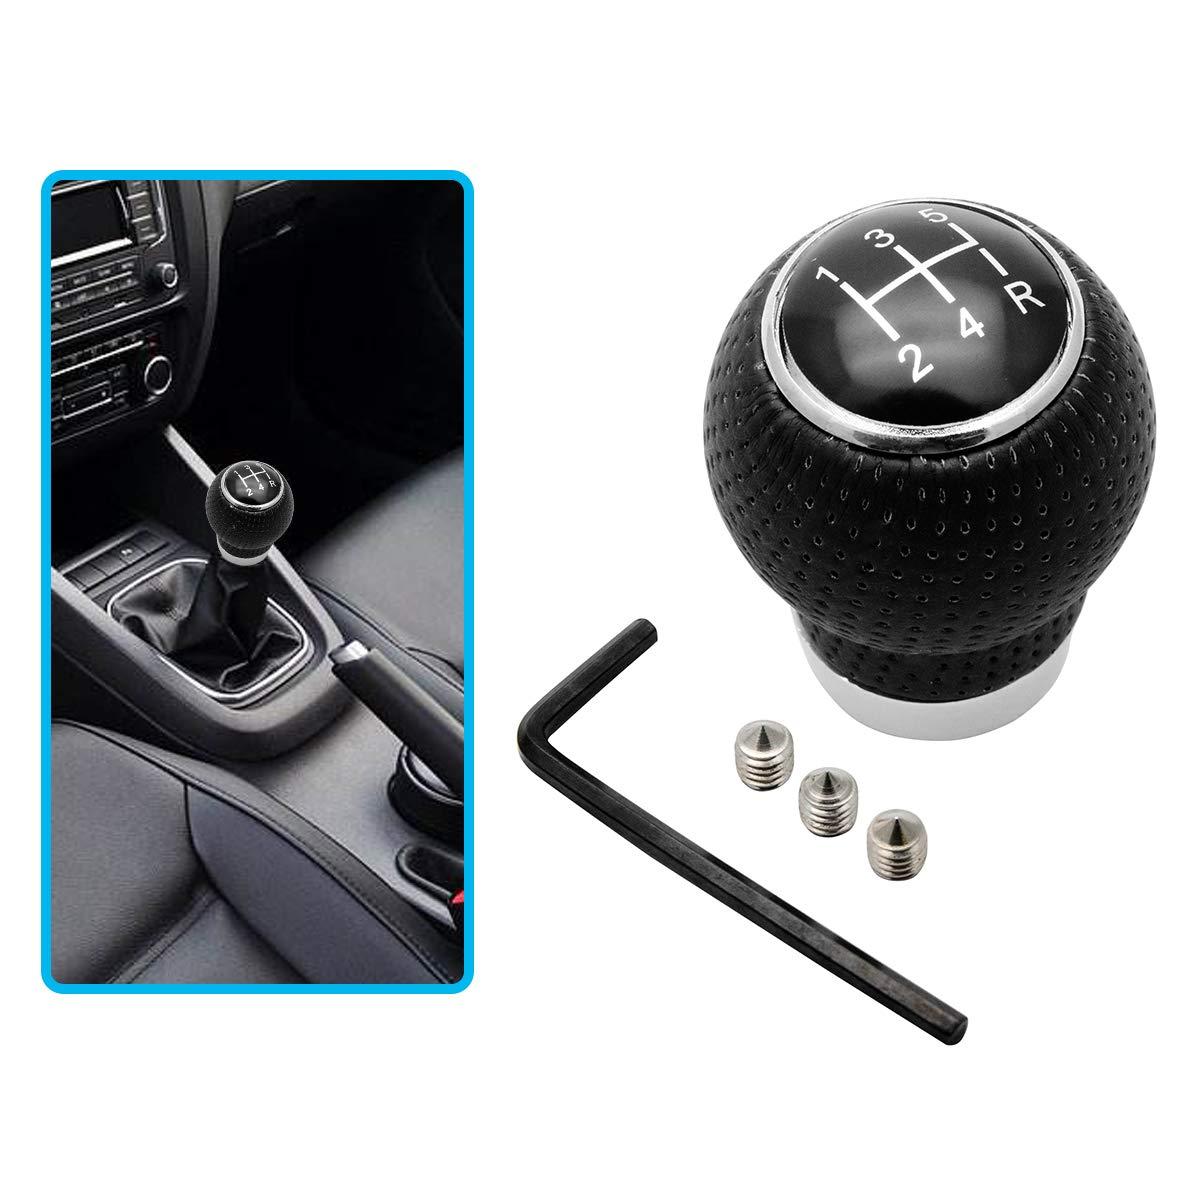 Ersatz Universal Auto Handstick Schalthebel MASO Schaltknaufe Runde Shifter Kugel Shifter M8//M10//M12